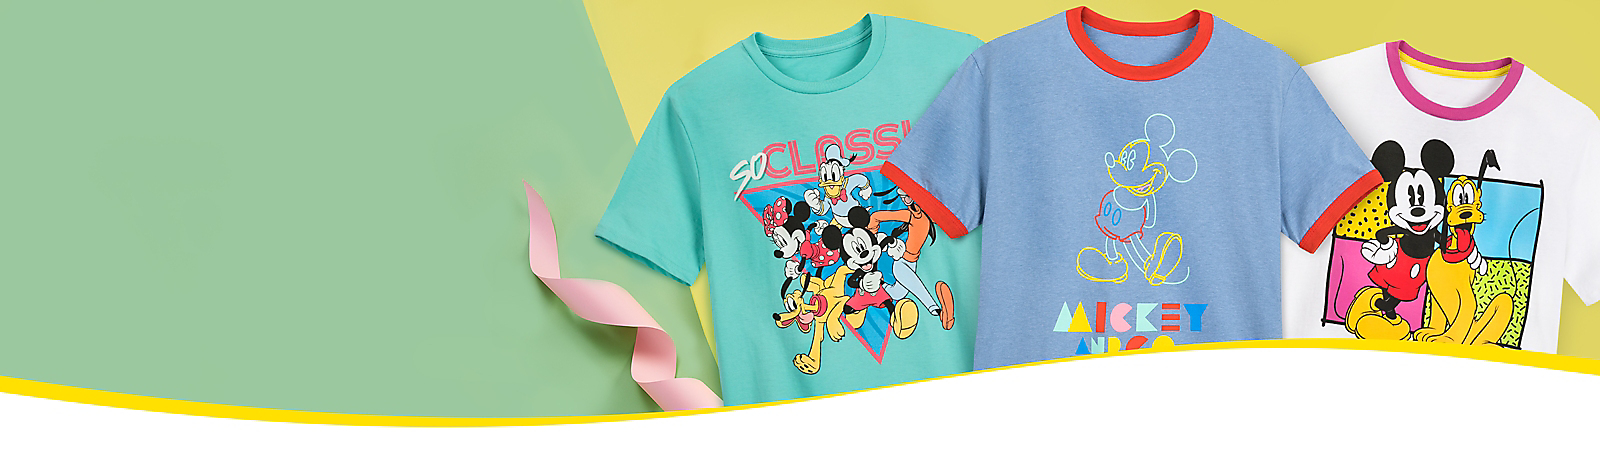 Marvel Ant-Man t-shirt 4 XXS 5-6 XS 7 S 14 16 XL 18 XXL Childs New